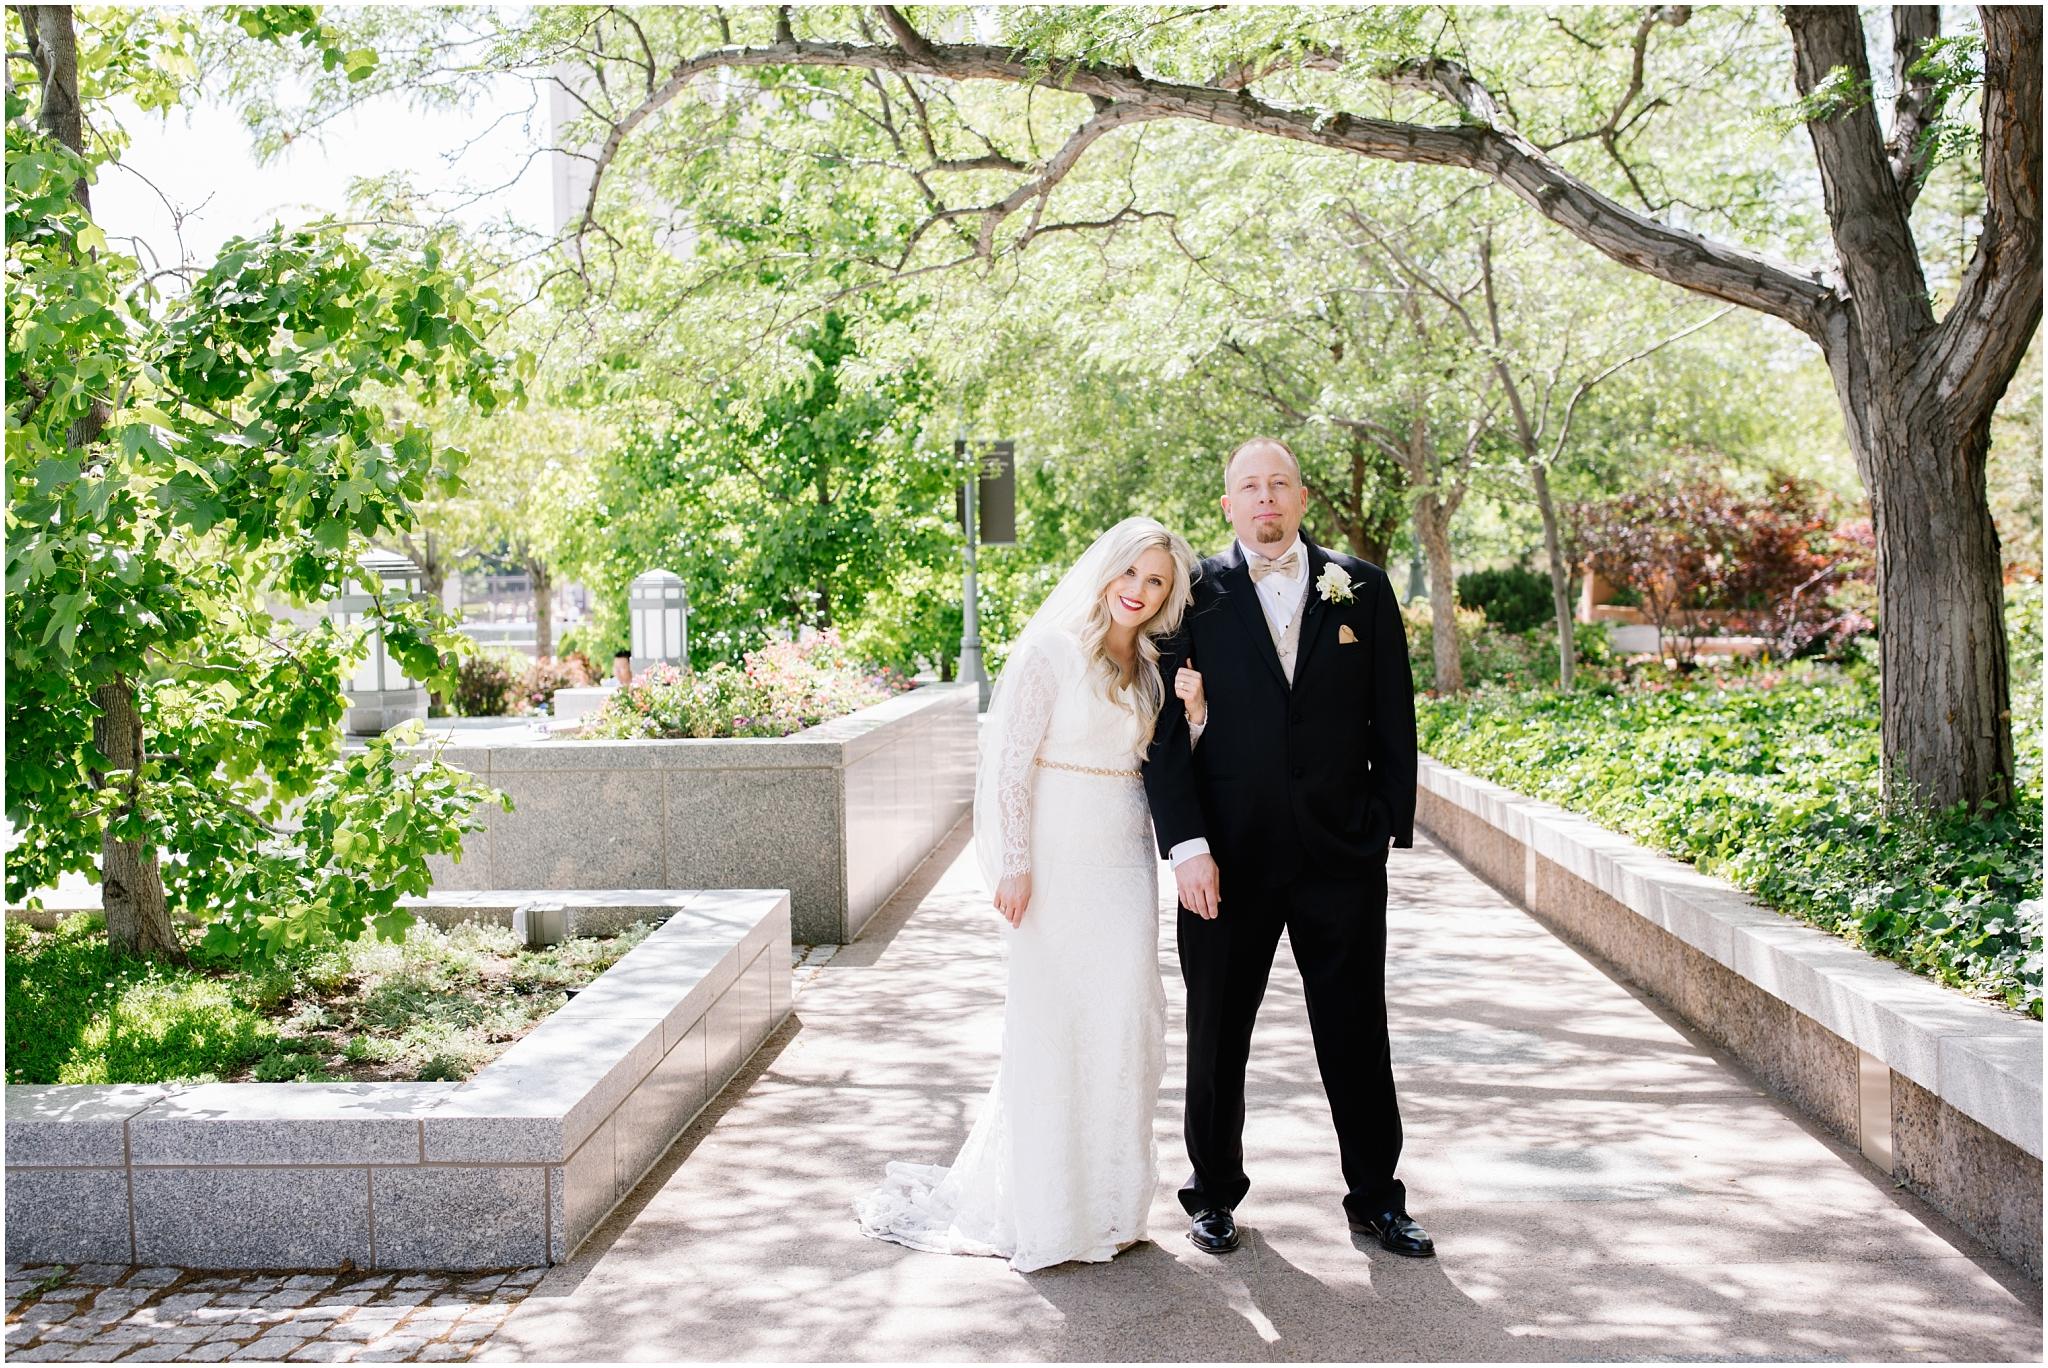 CherylandTyler-317_Lizzie-B-Imagery-Utah-Wedding-Photographer-Salt-Lake-City-Temple-Wells-Fargo-Building-Reception.jpg